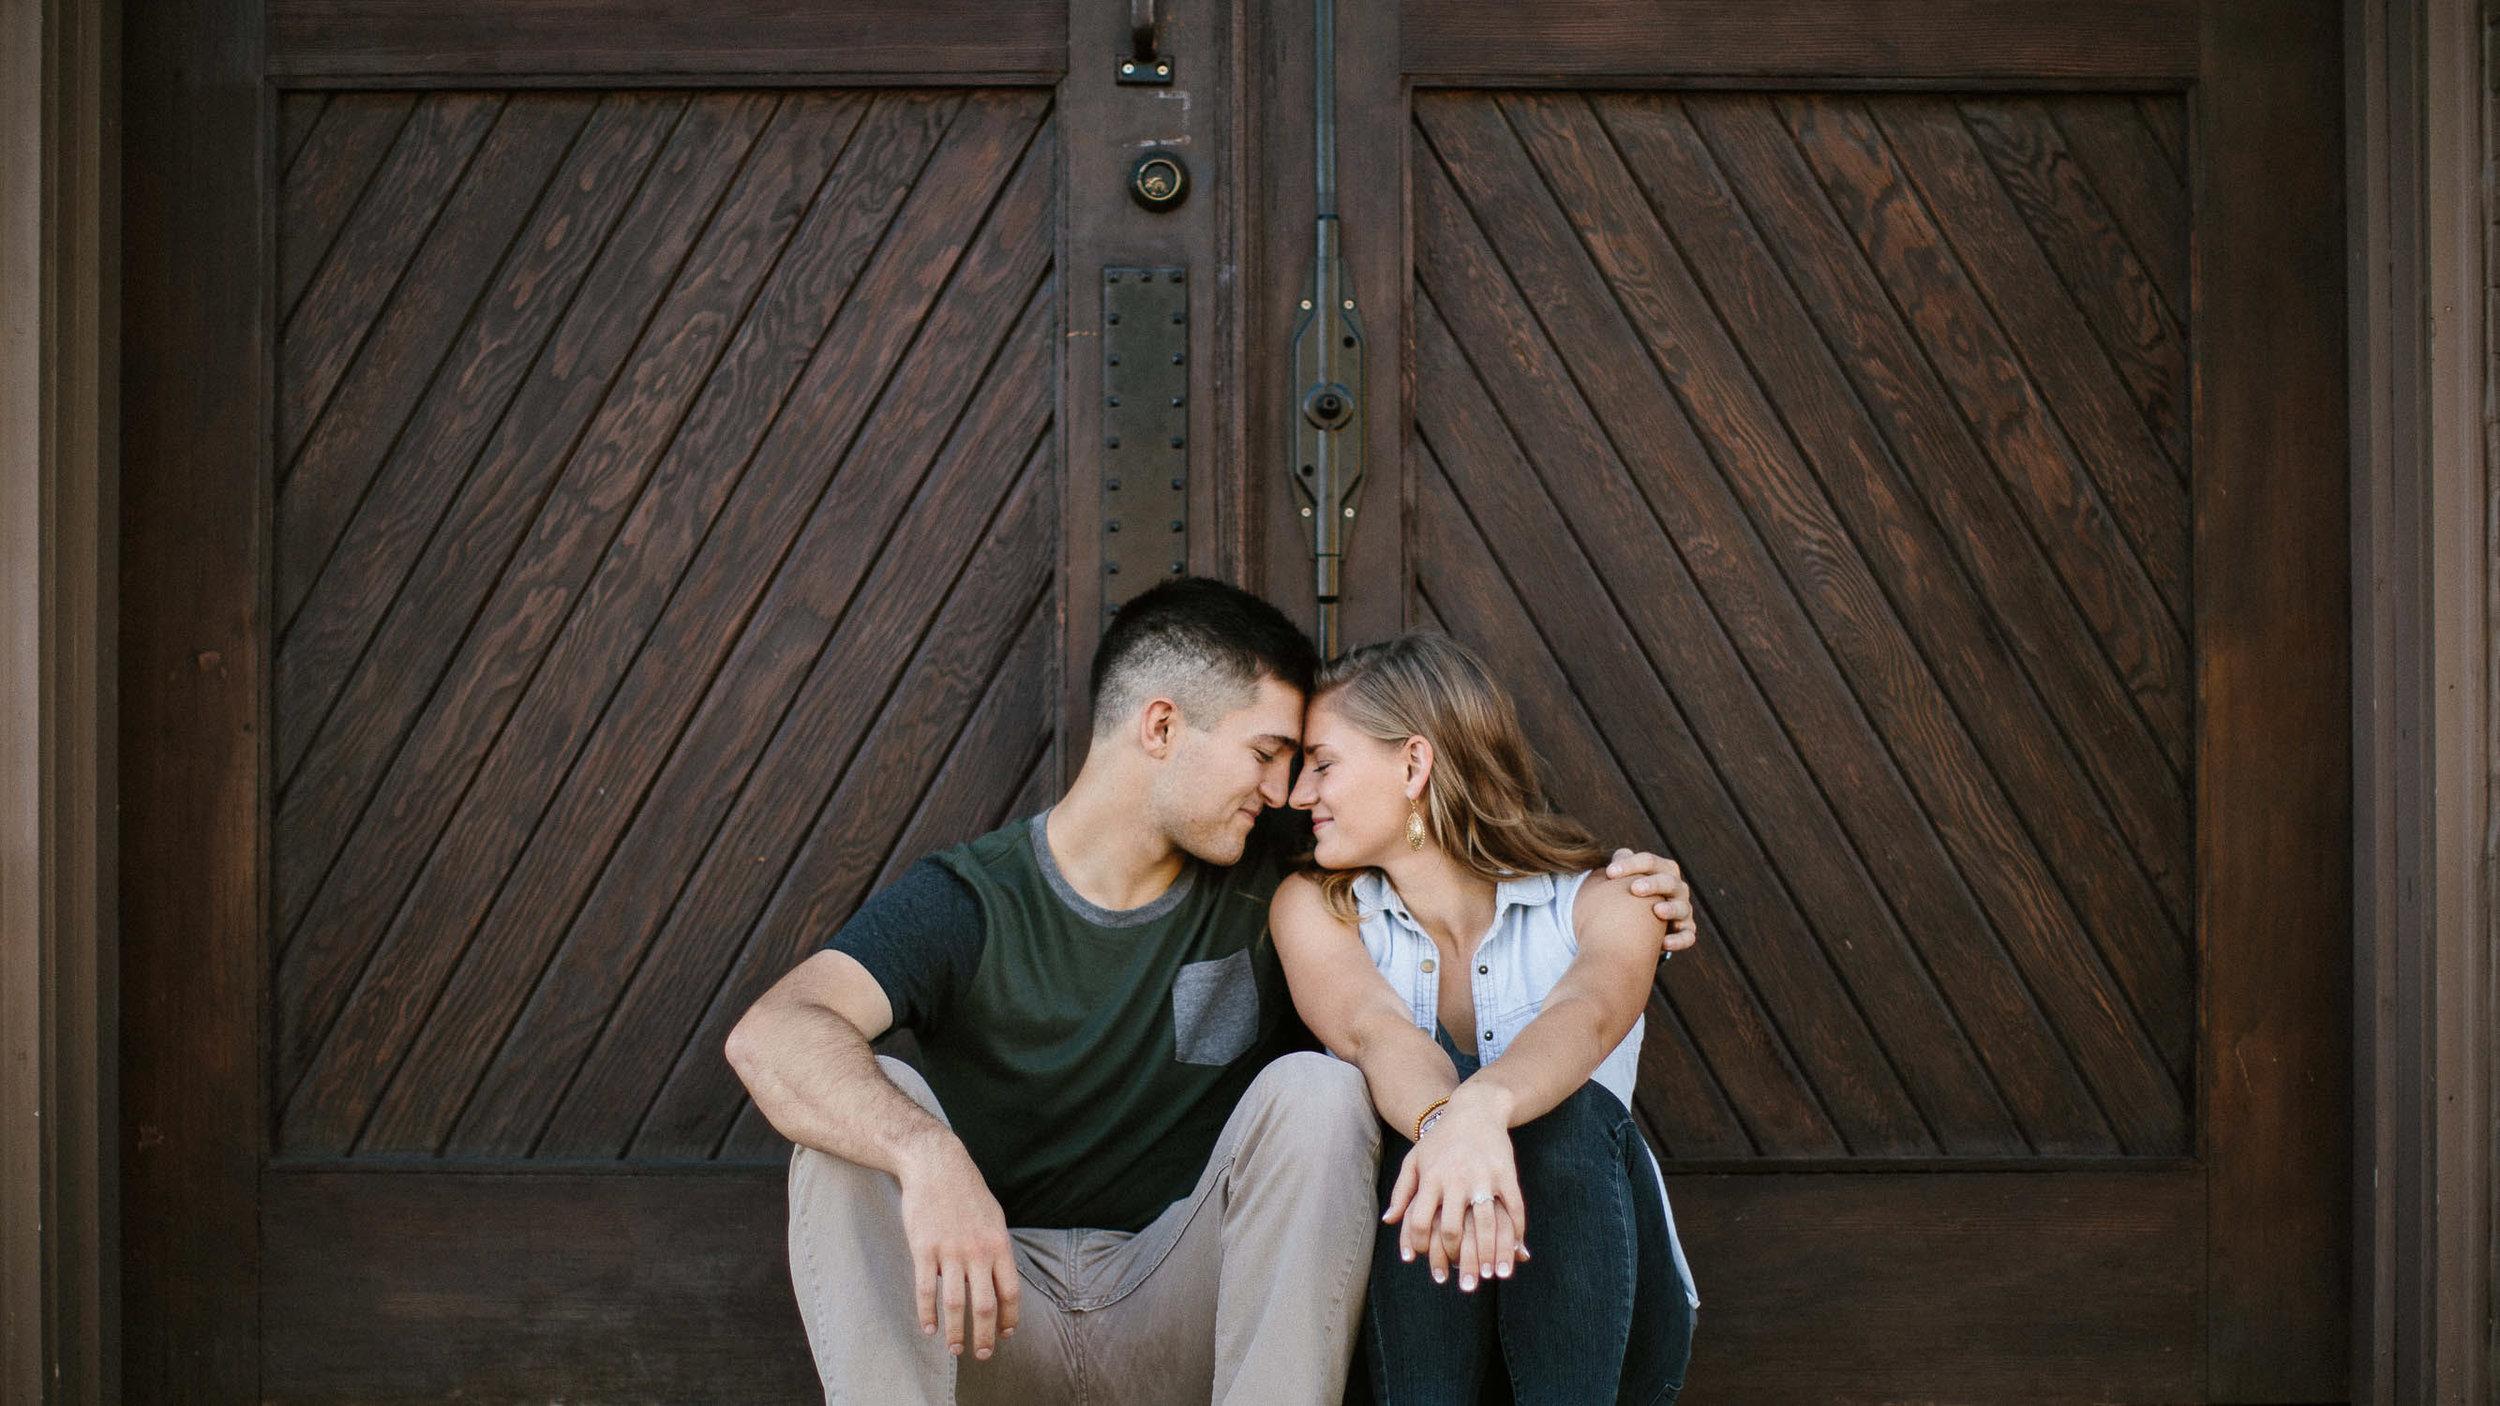 Romantic_Timeless_Downtown_SiouxFalls_Engagement_Wedding_Photographer_18.jpg